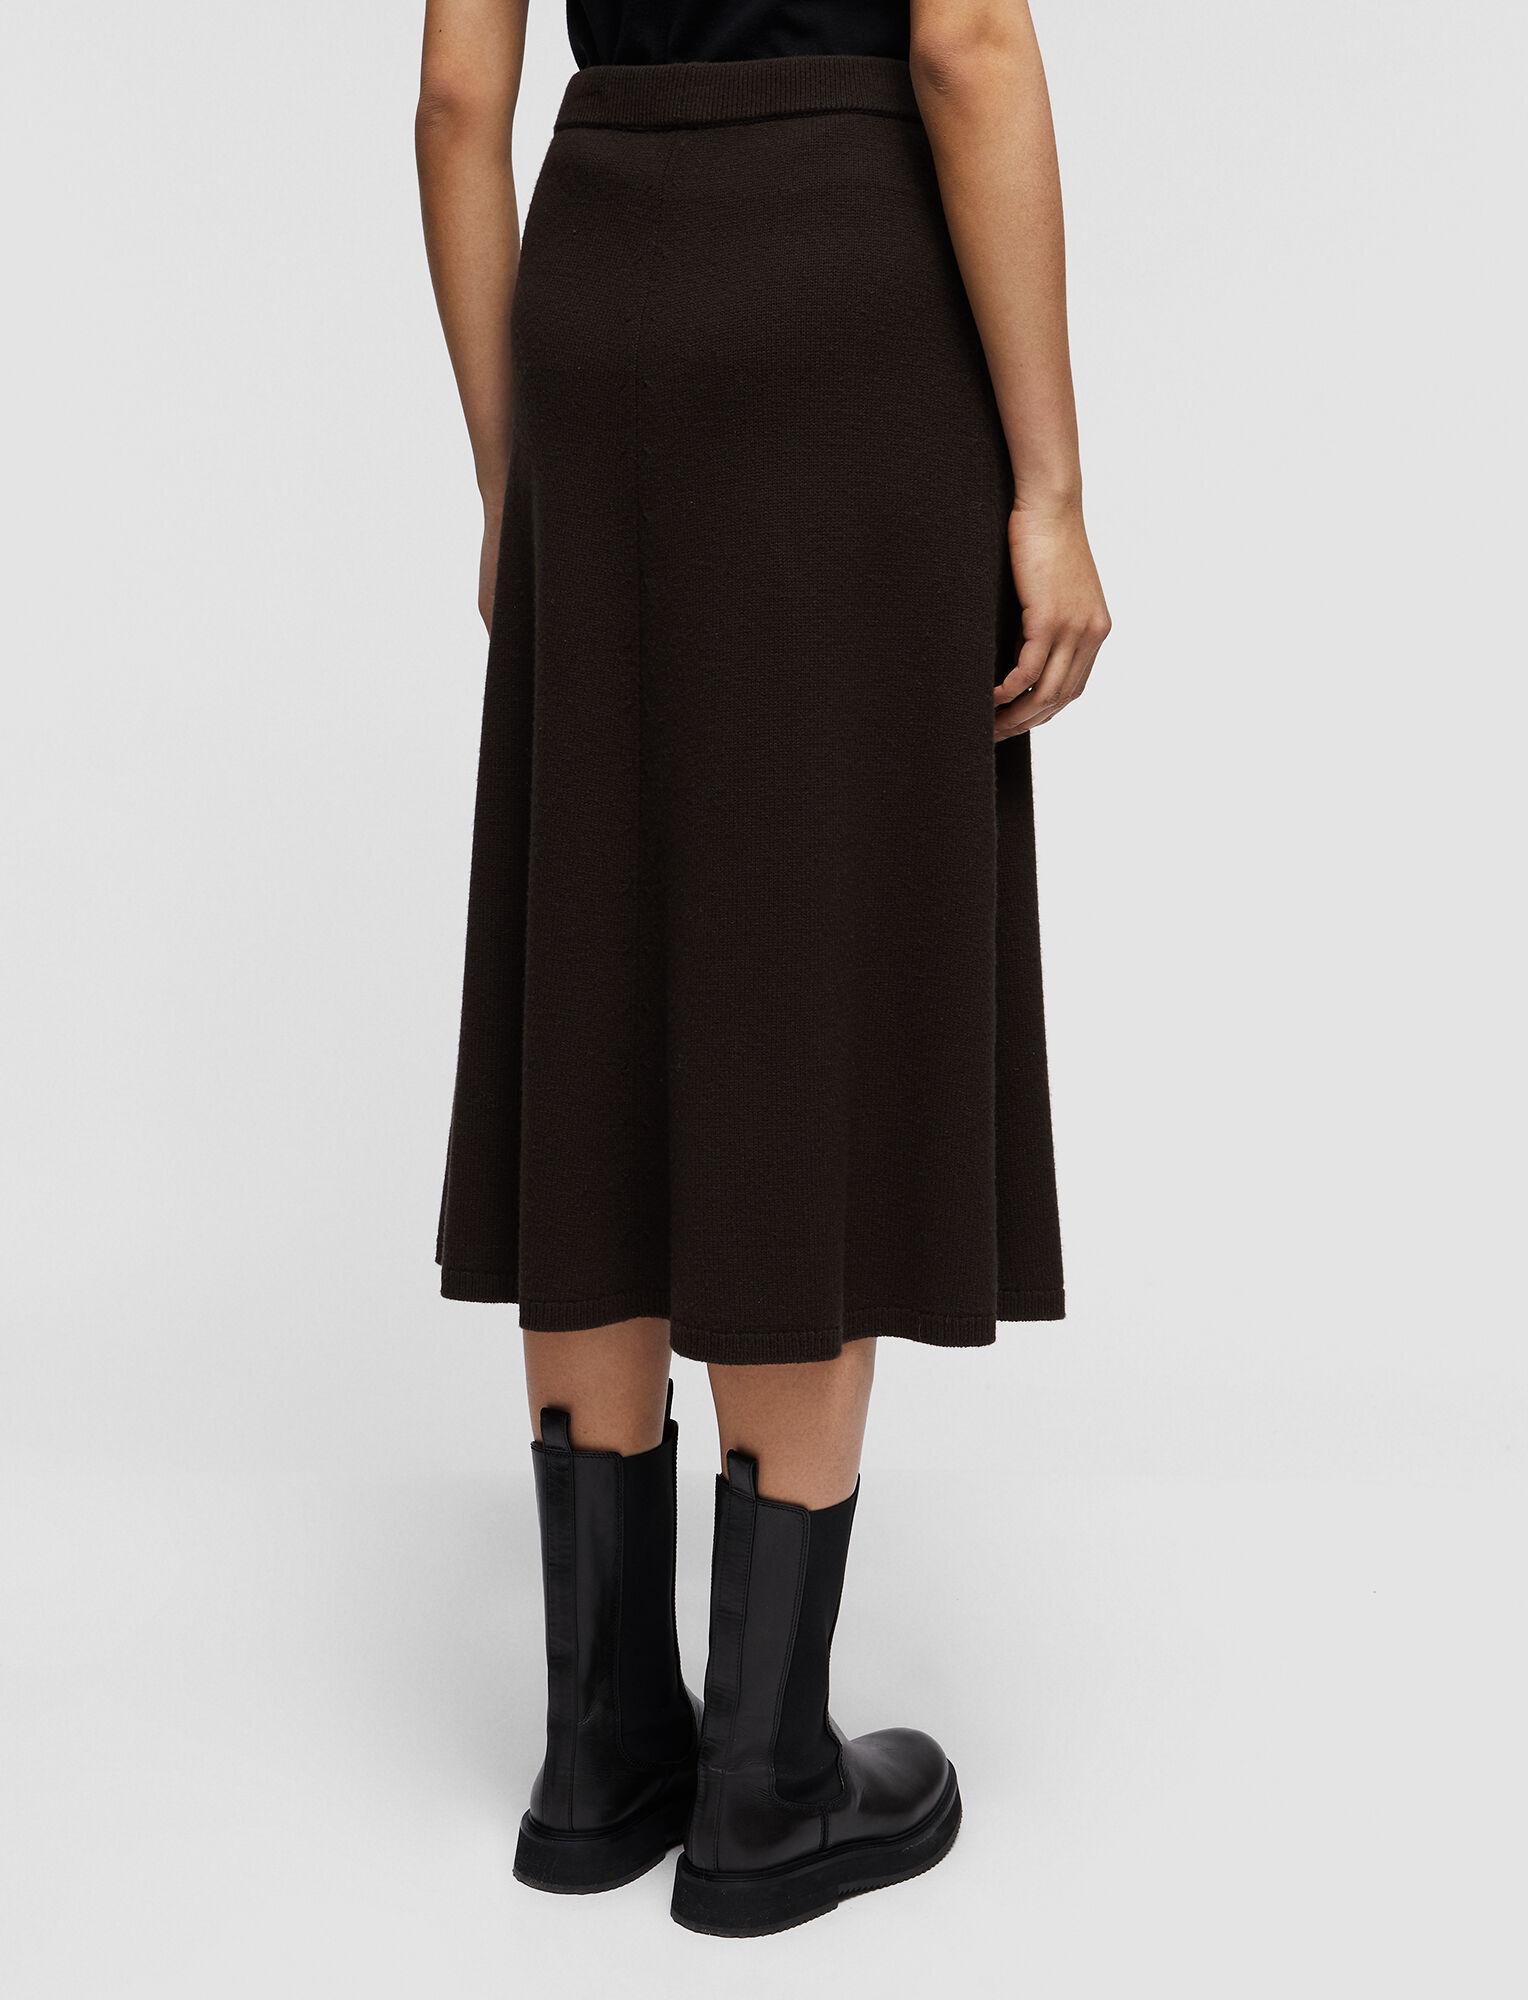 Joseph, Soft Wool Skirt, in JAVA